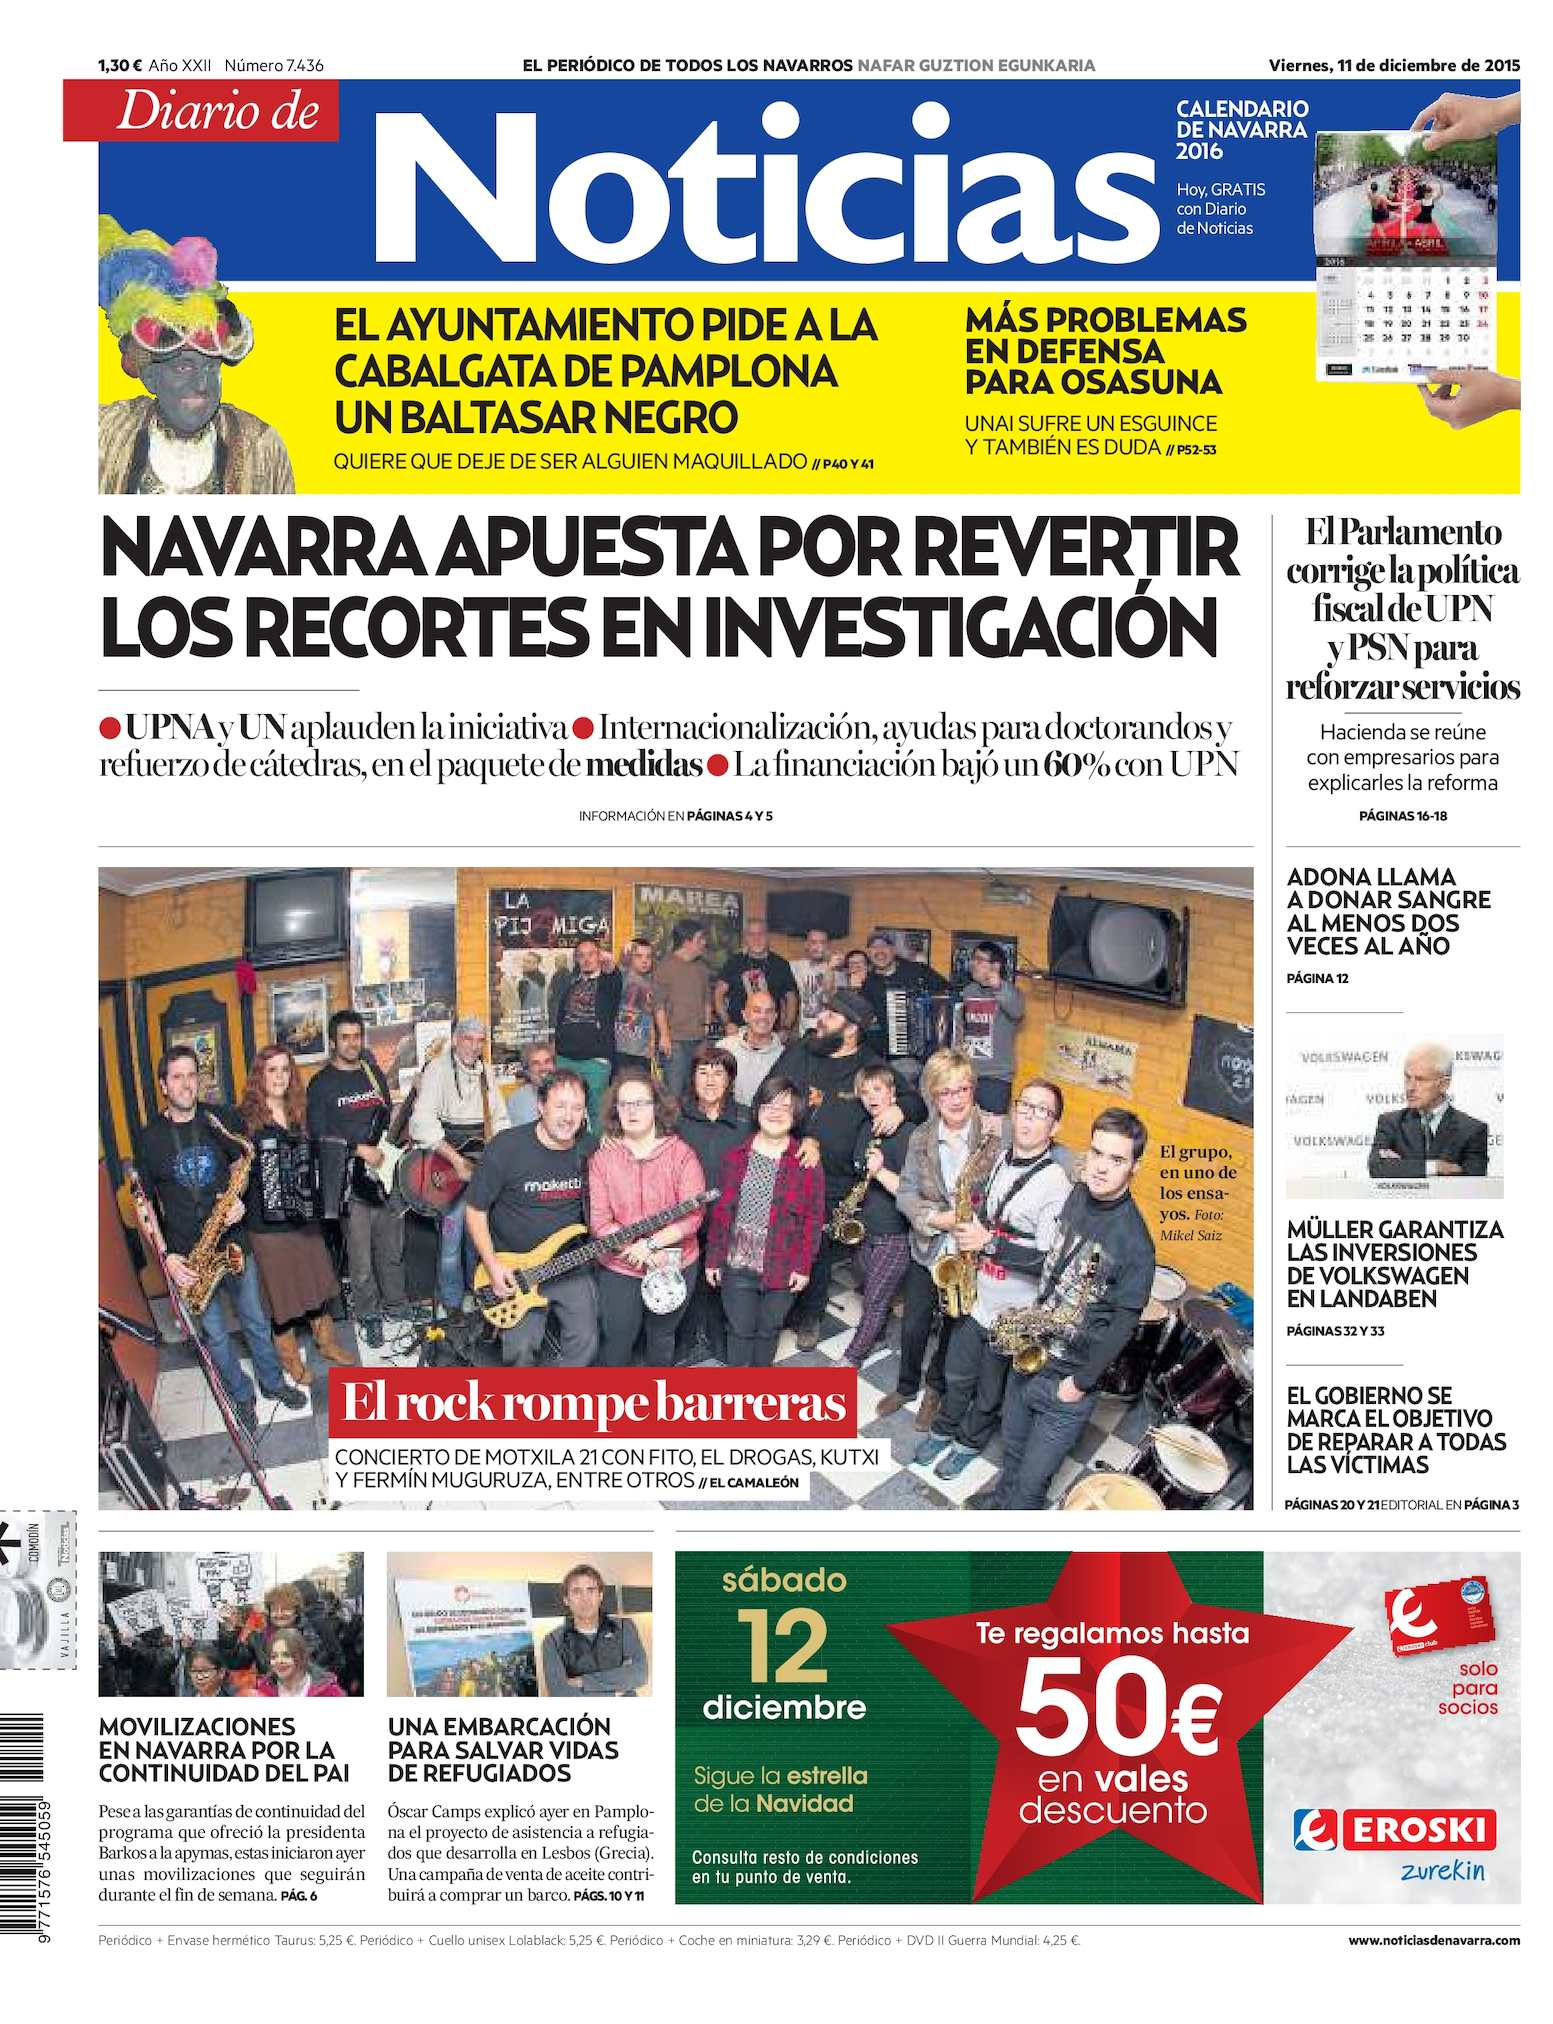 lorenzo caprile perdida de peso repentina